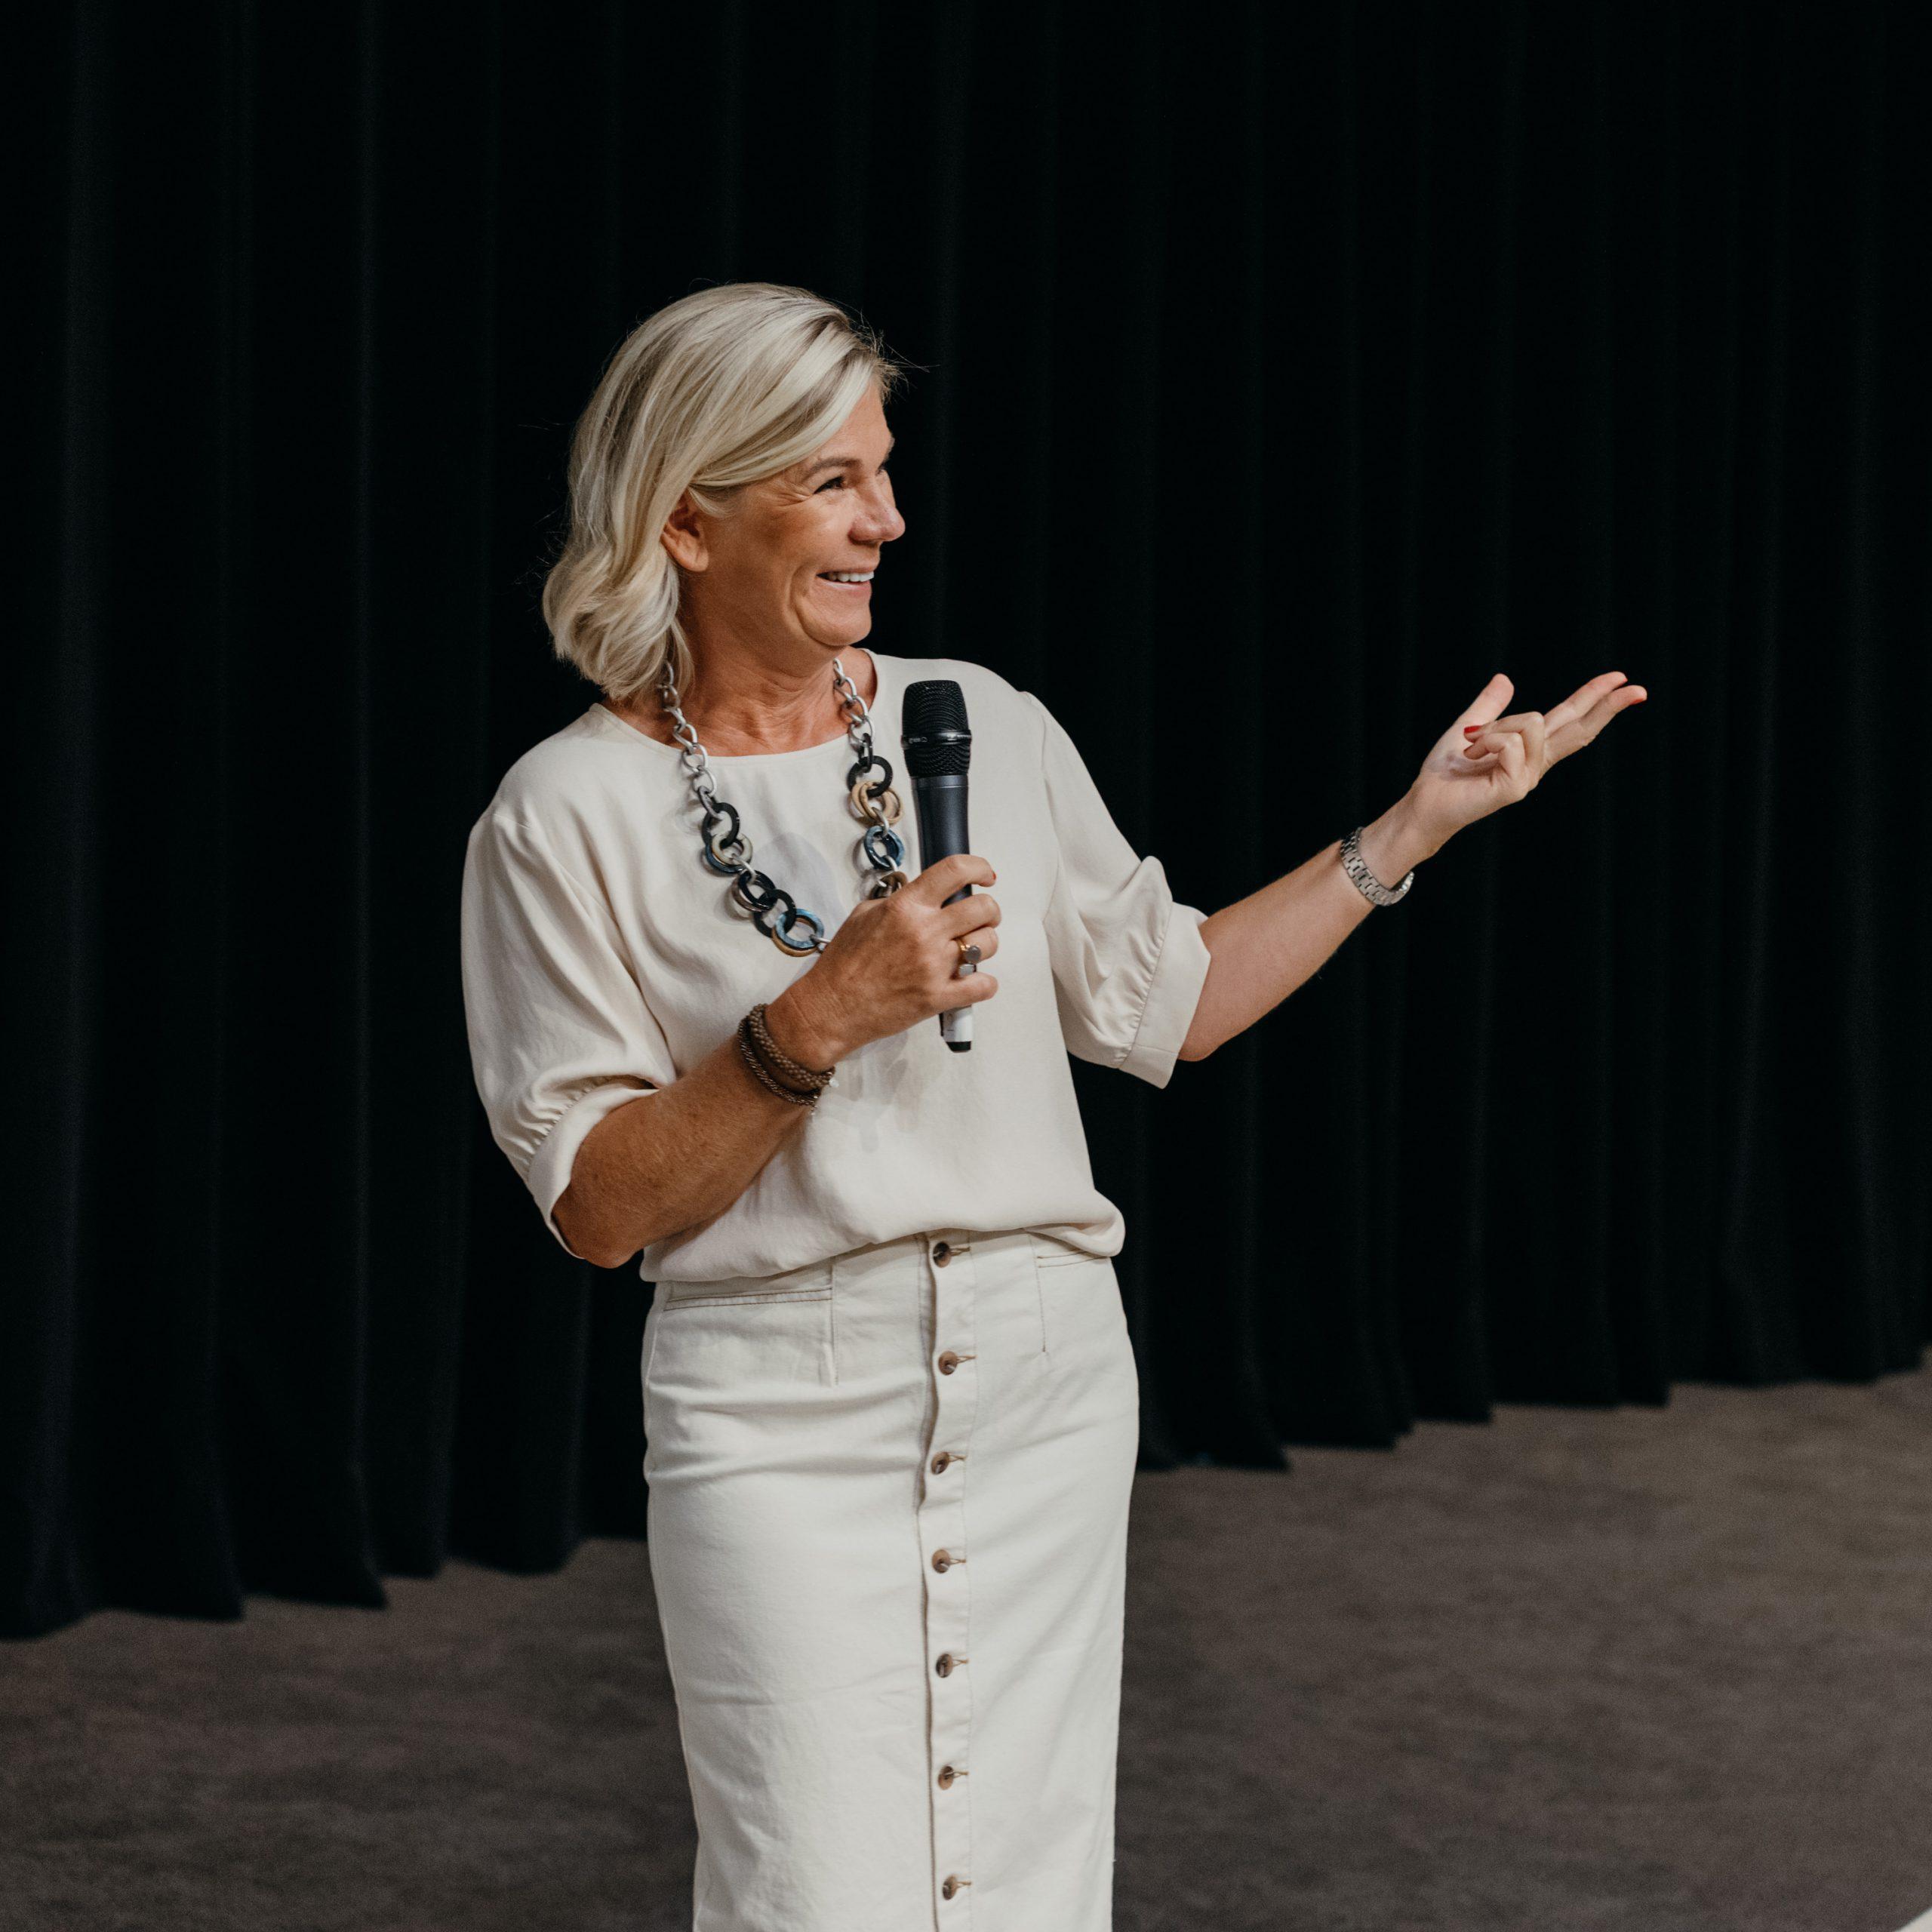 Karoline Fievez – Director Teamleiders.nu Belgium